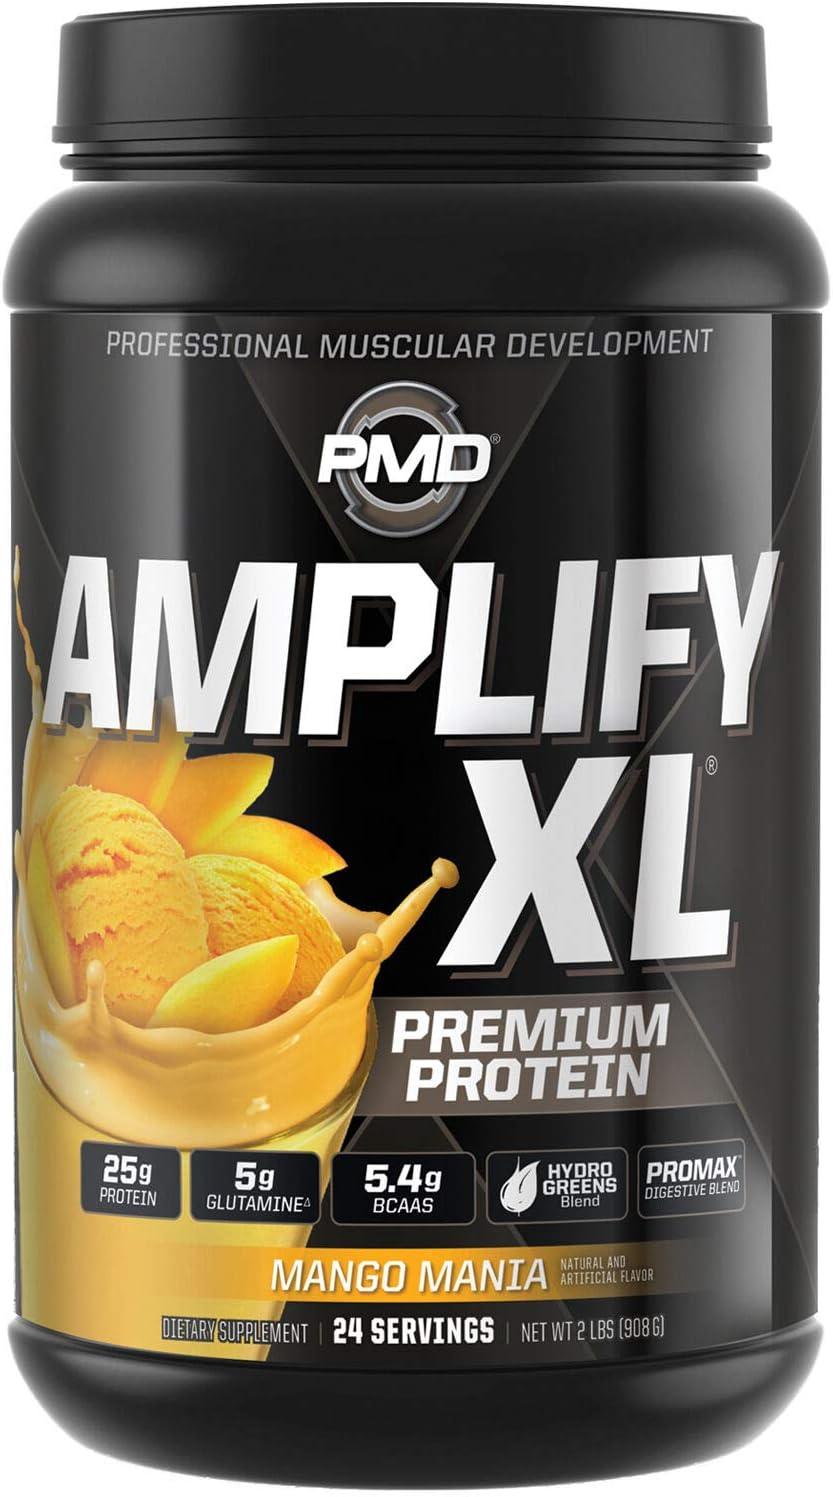 PMD PMD Amplify XL Protein – Mango Mania 2 lbs.